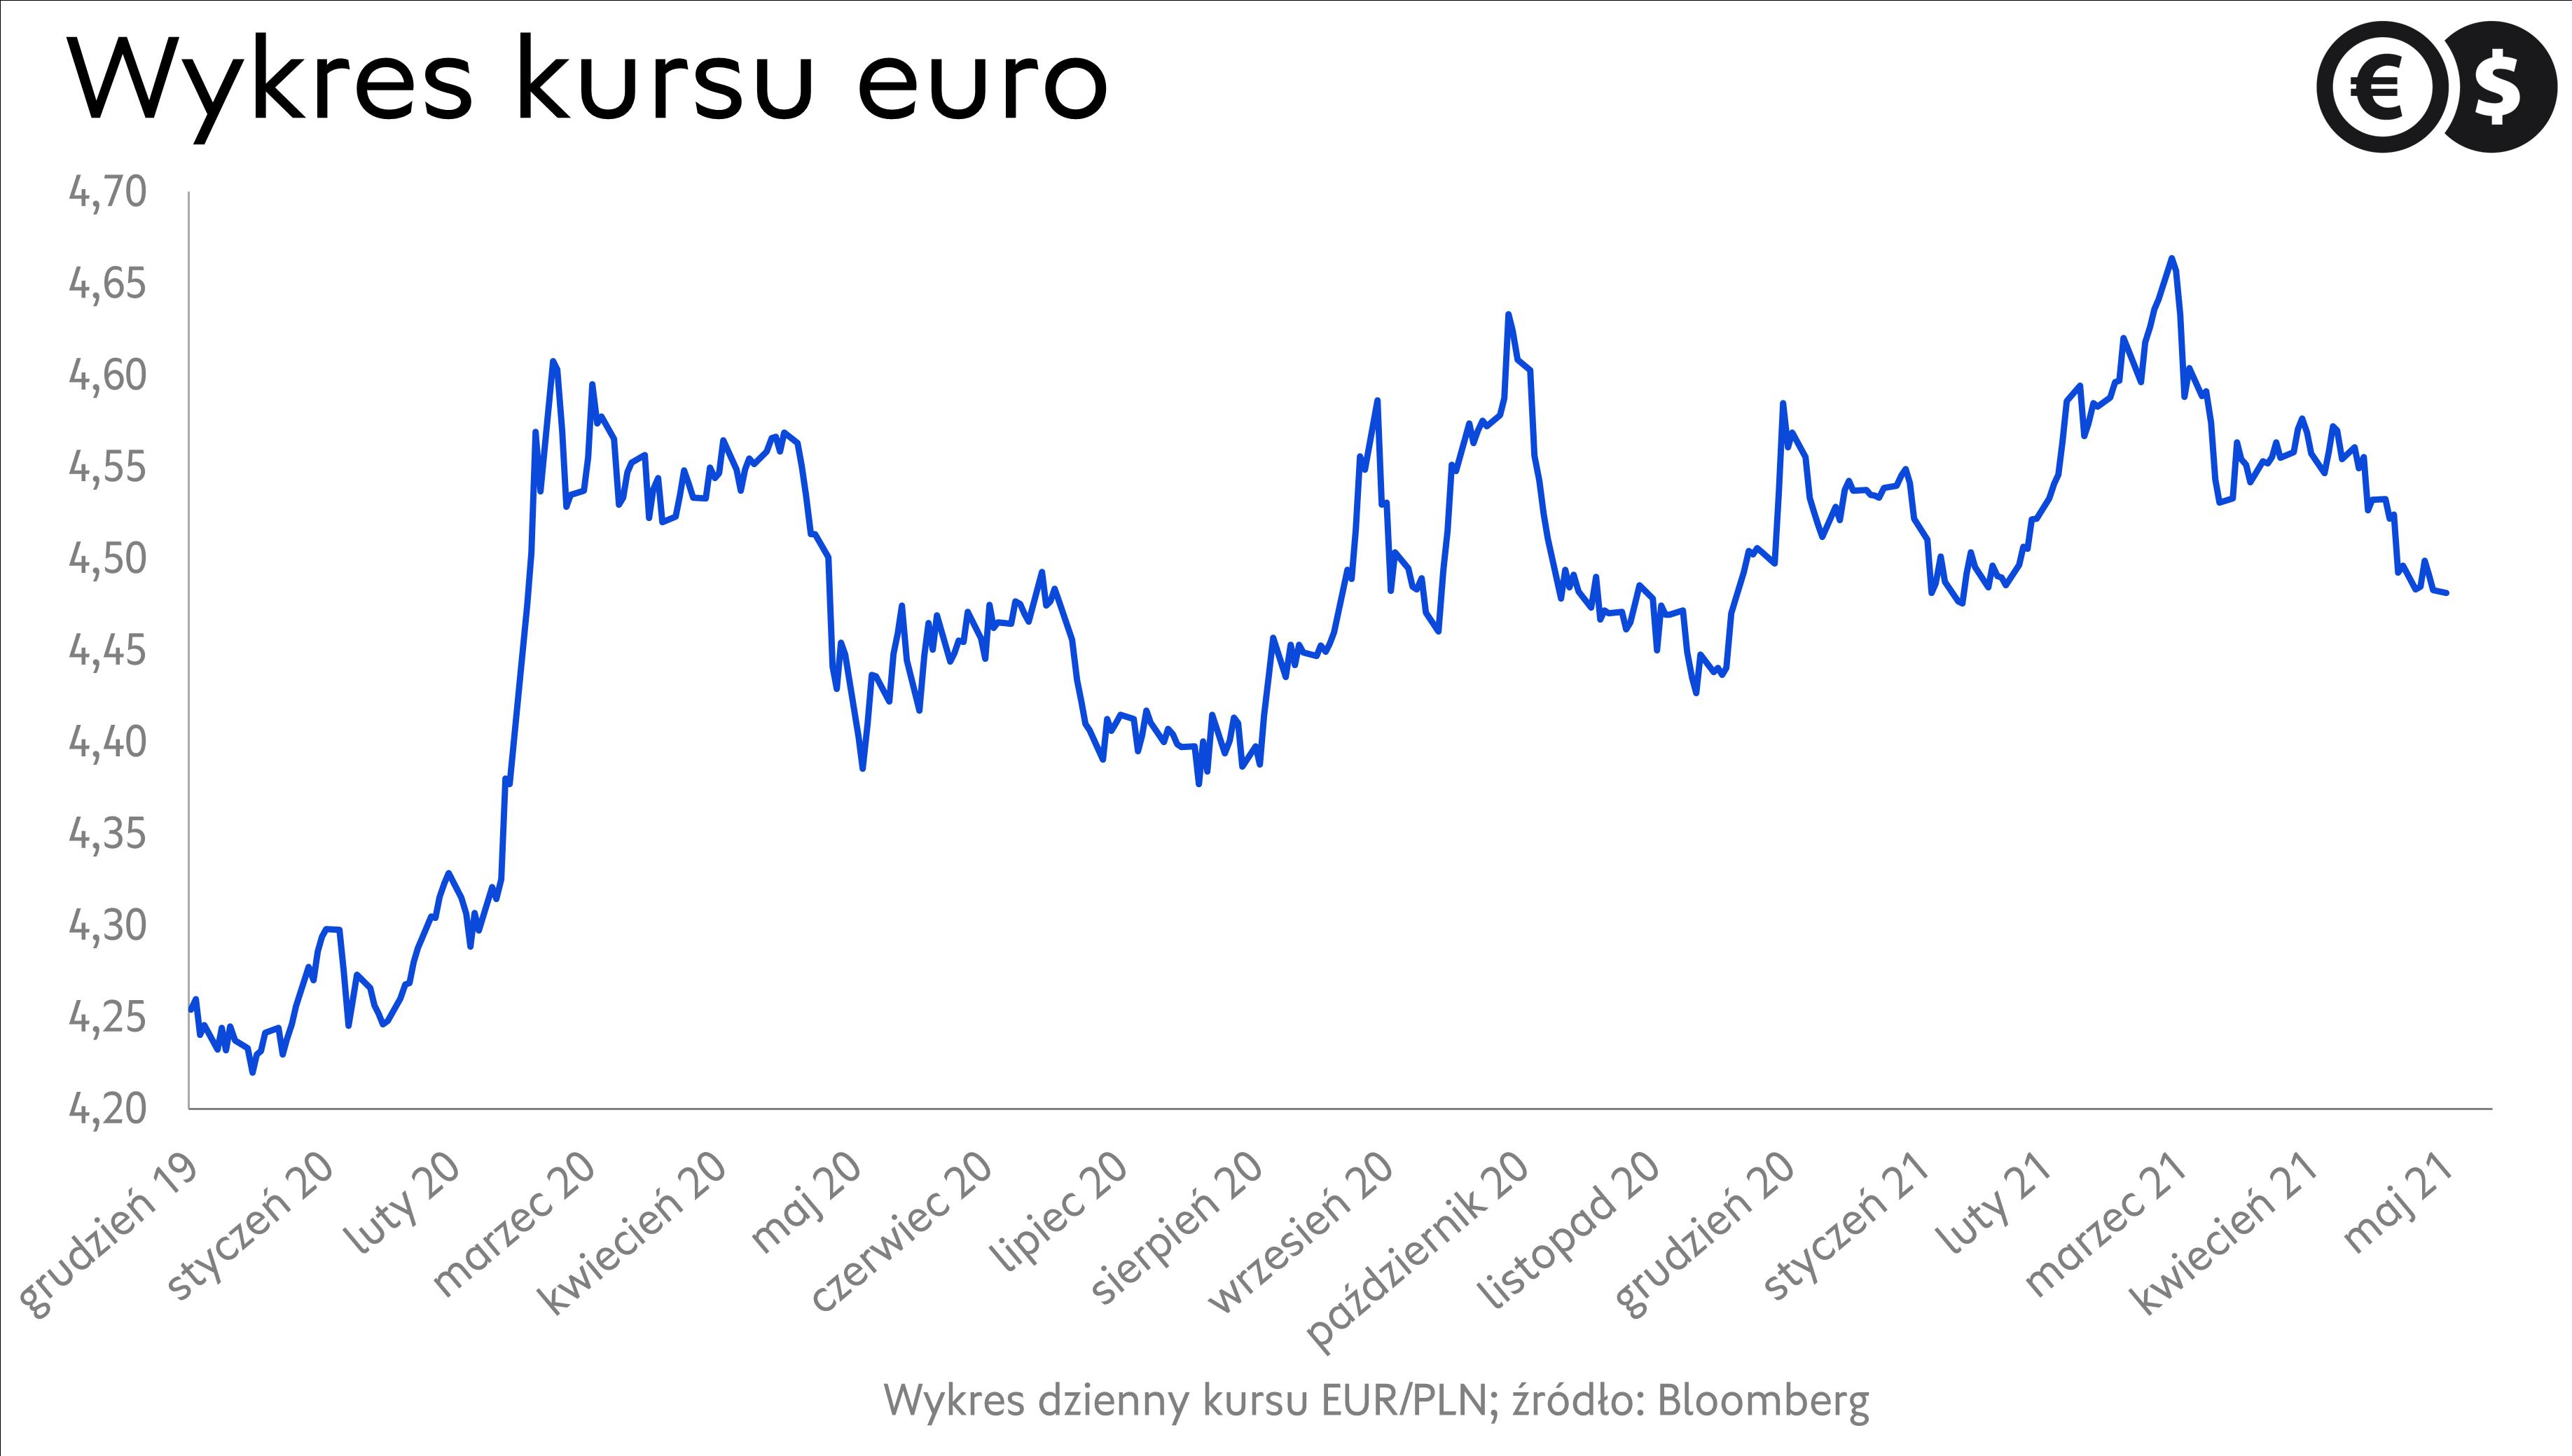 Kurs EUR/PLN, źródło: Bloomberg